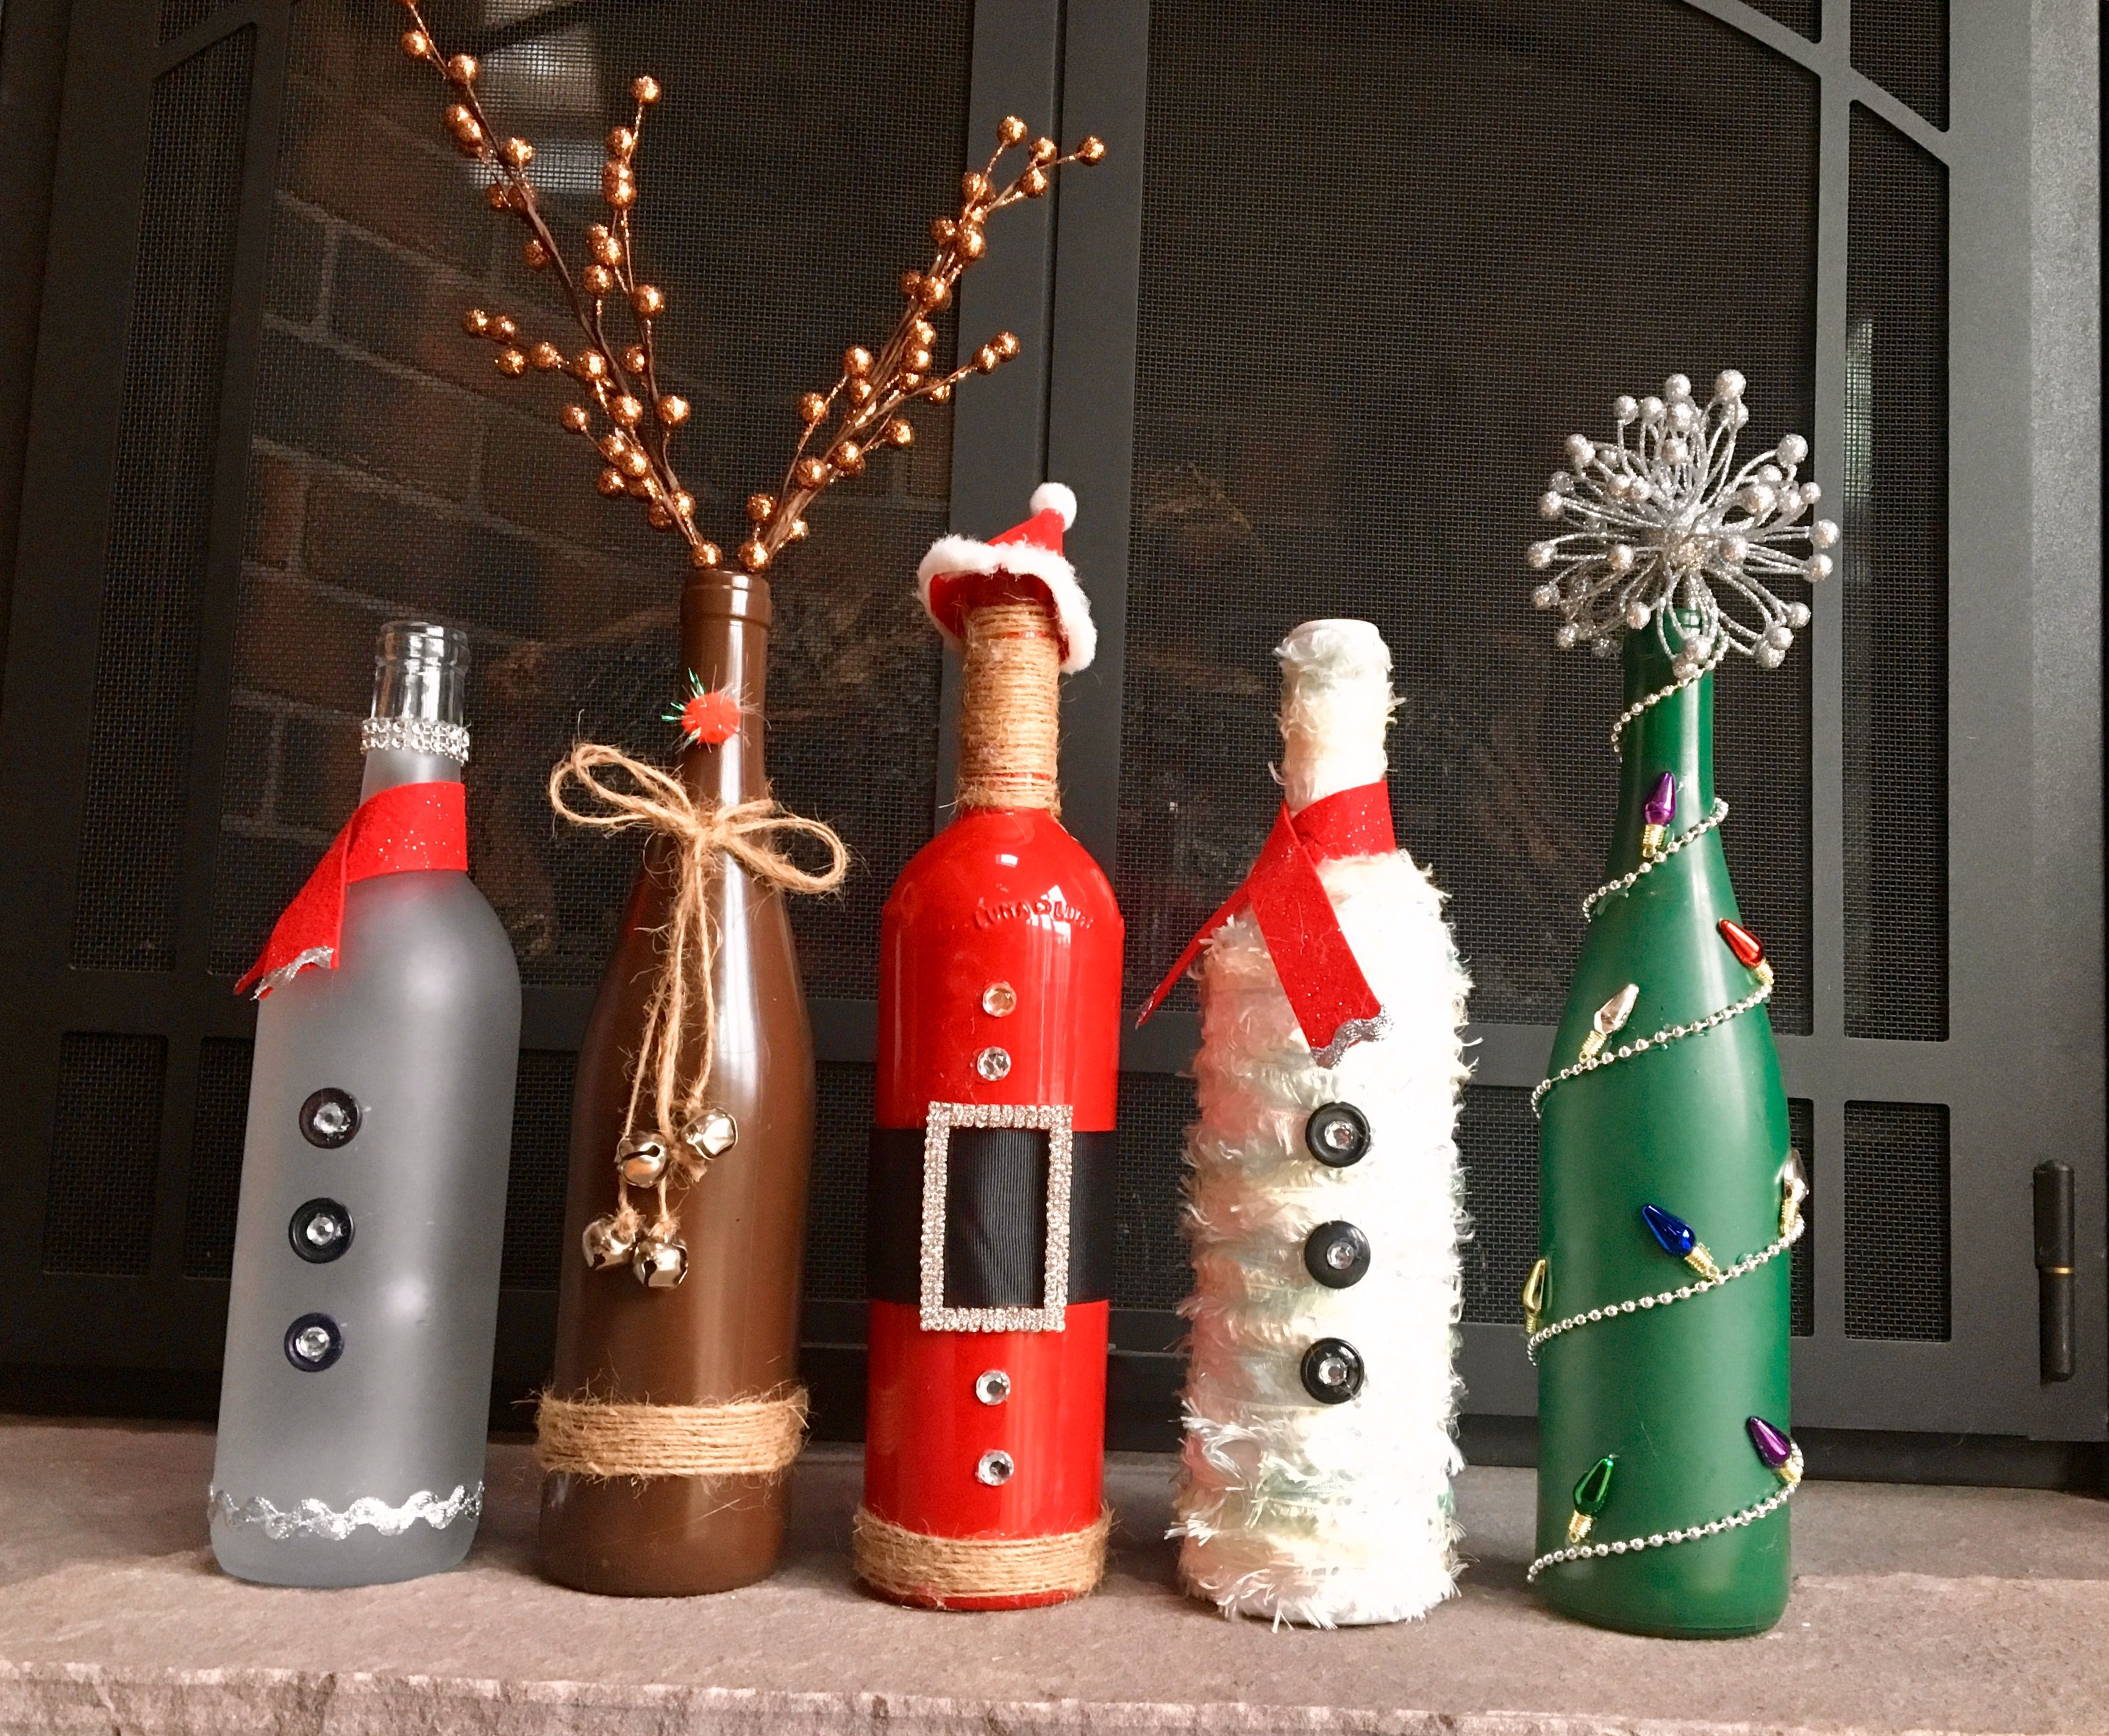 Christmas Wine Bottle Decor Bottles Decoration Wine Bottle Decor Christmas Wine Bottles